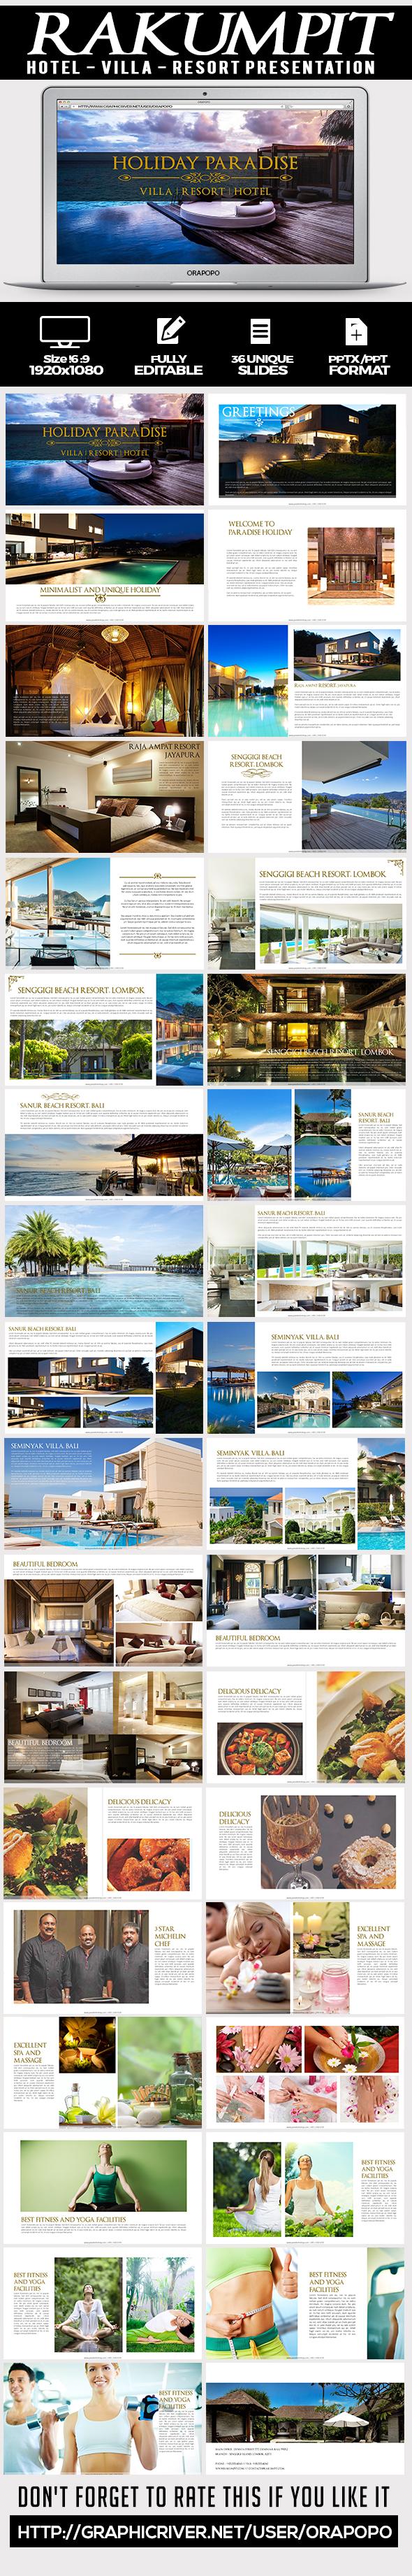 rakumpit ~ hotel and resort presentation templateorapopo, Modern powerpoint